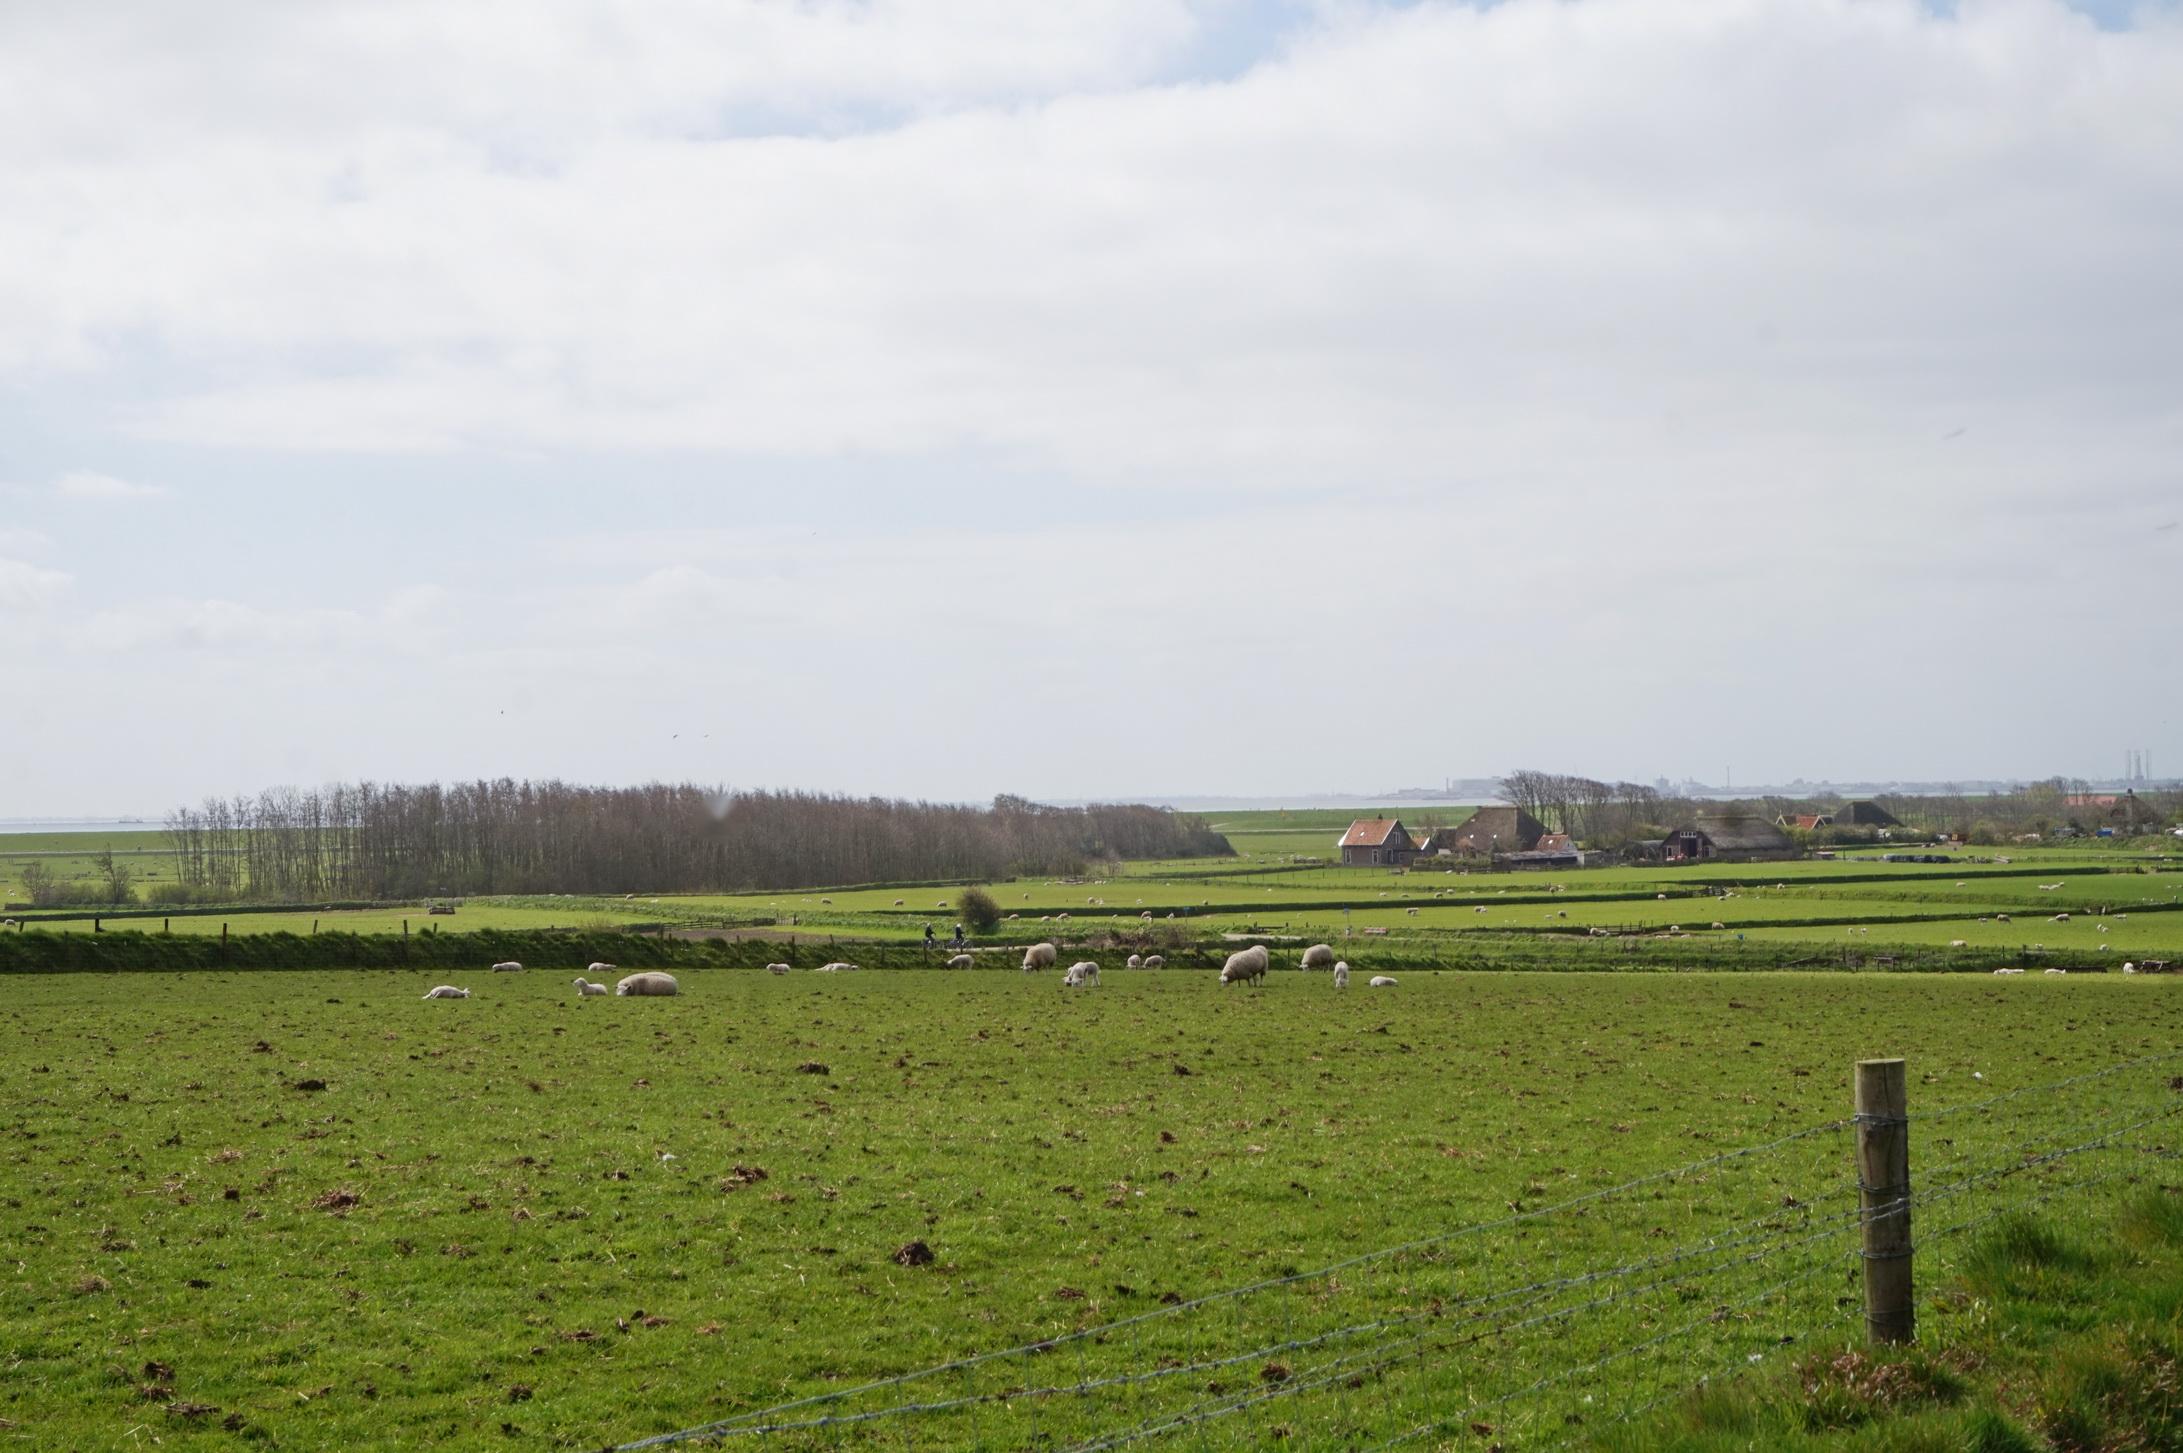 Texel - Wanderung VOC-Route 13